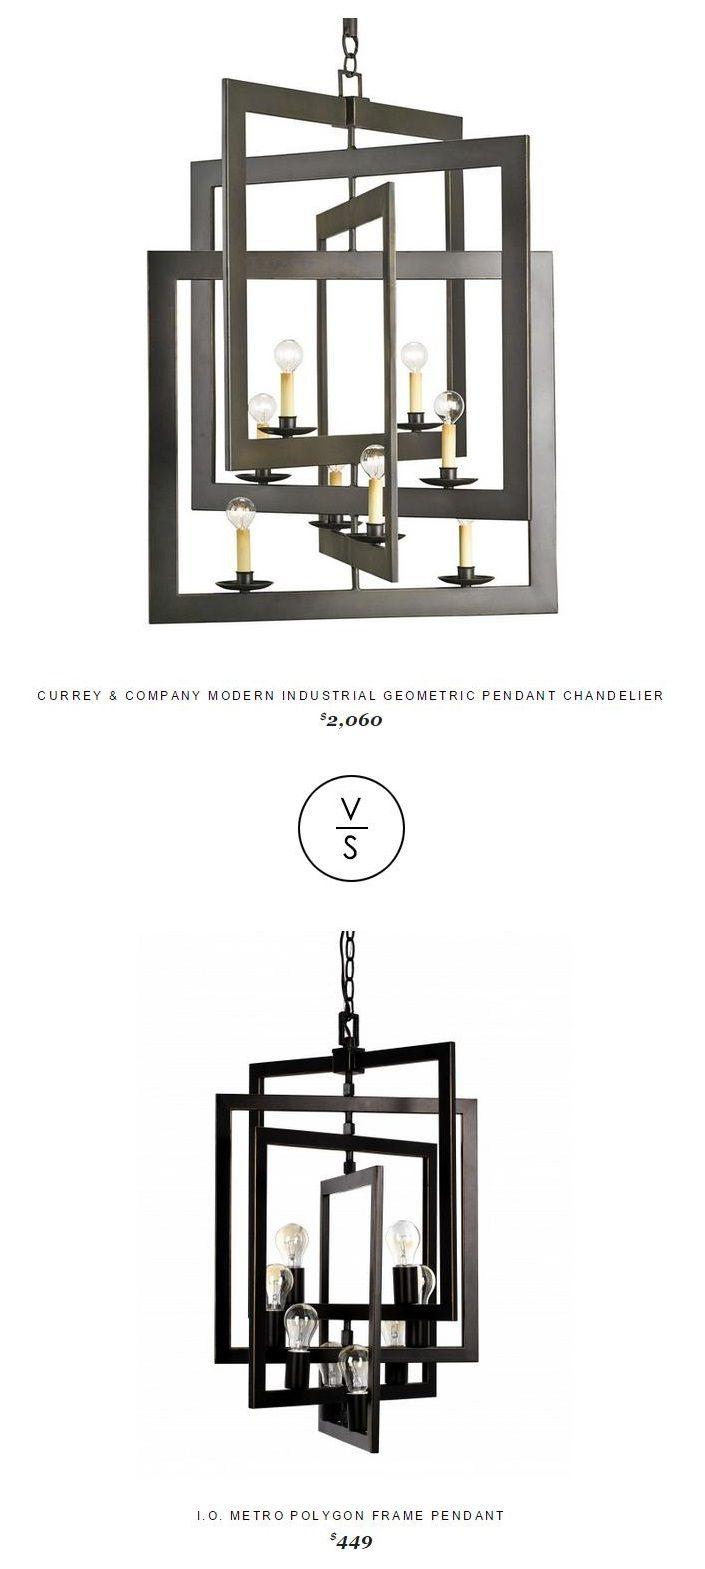 Currey Company Modern Industrial Geometric Pendant Chandelier